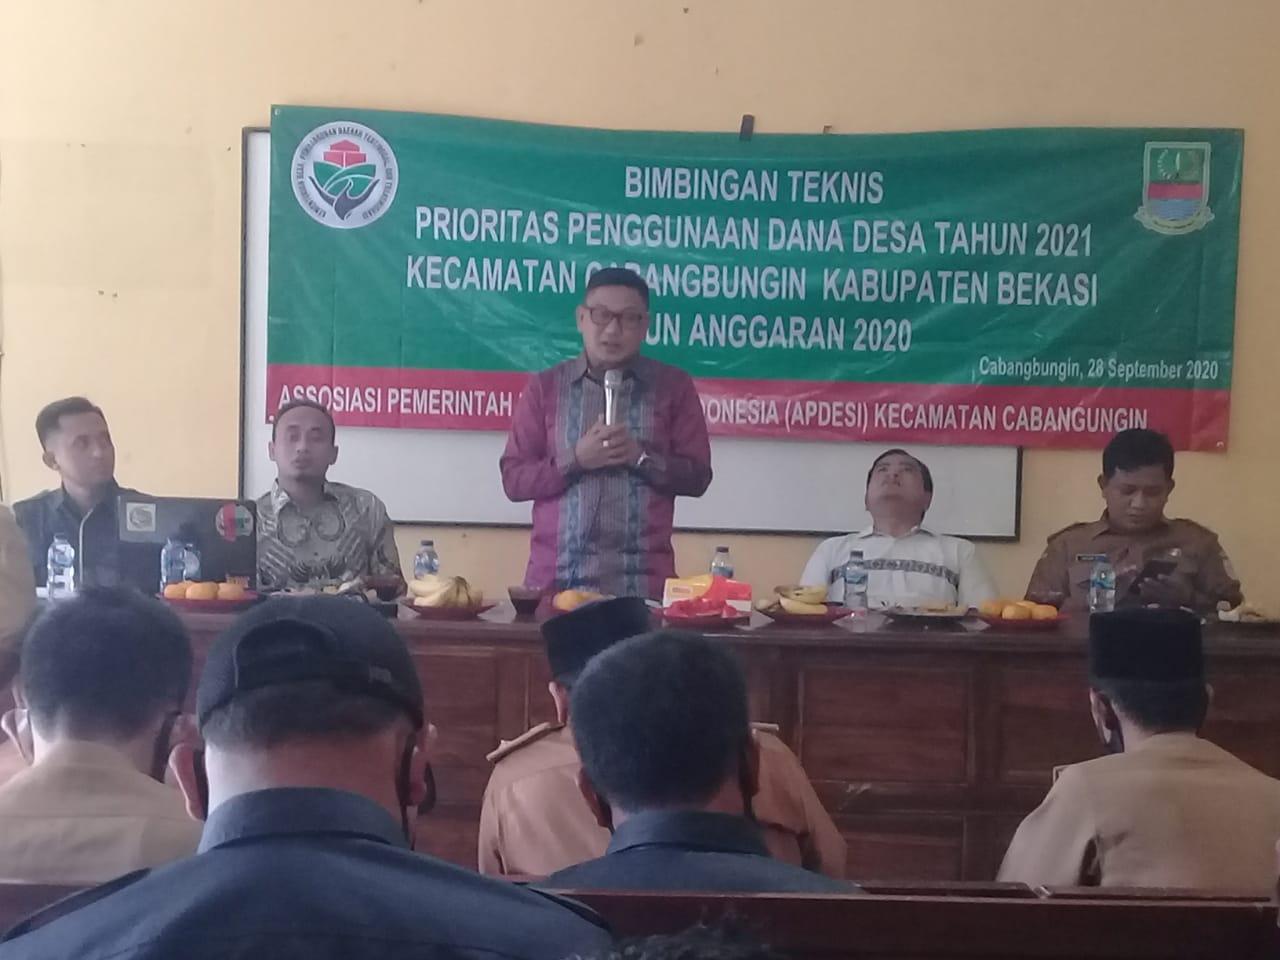 Bimbingan Teknis tentang Prioritas Penggunaan Dana Desa tahun 2021 yang di laksanakan di aula Desa Sindangjaya Kecamatan Cabangbungin Kabupaten Bekasi